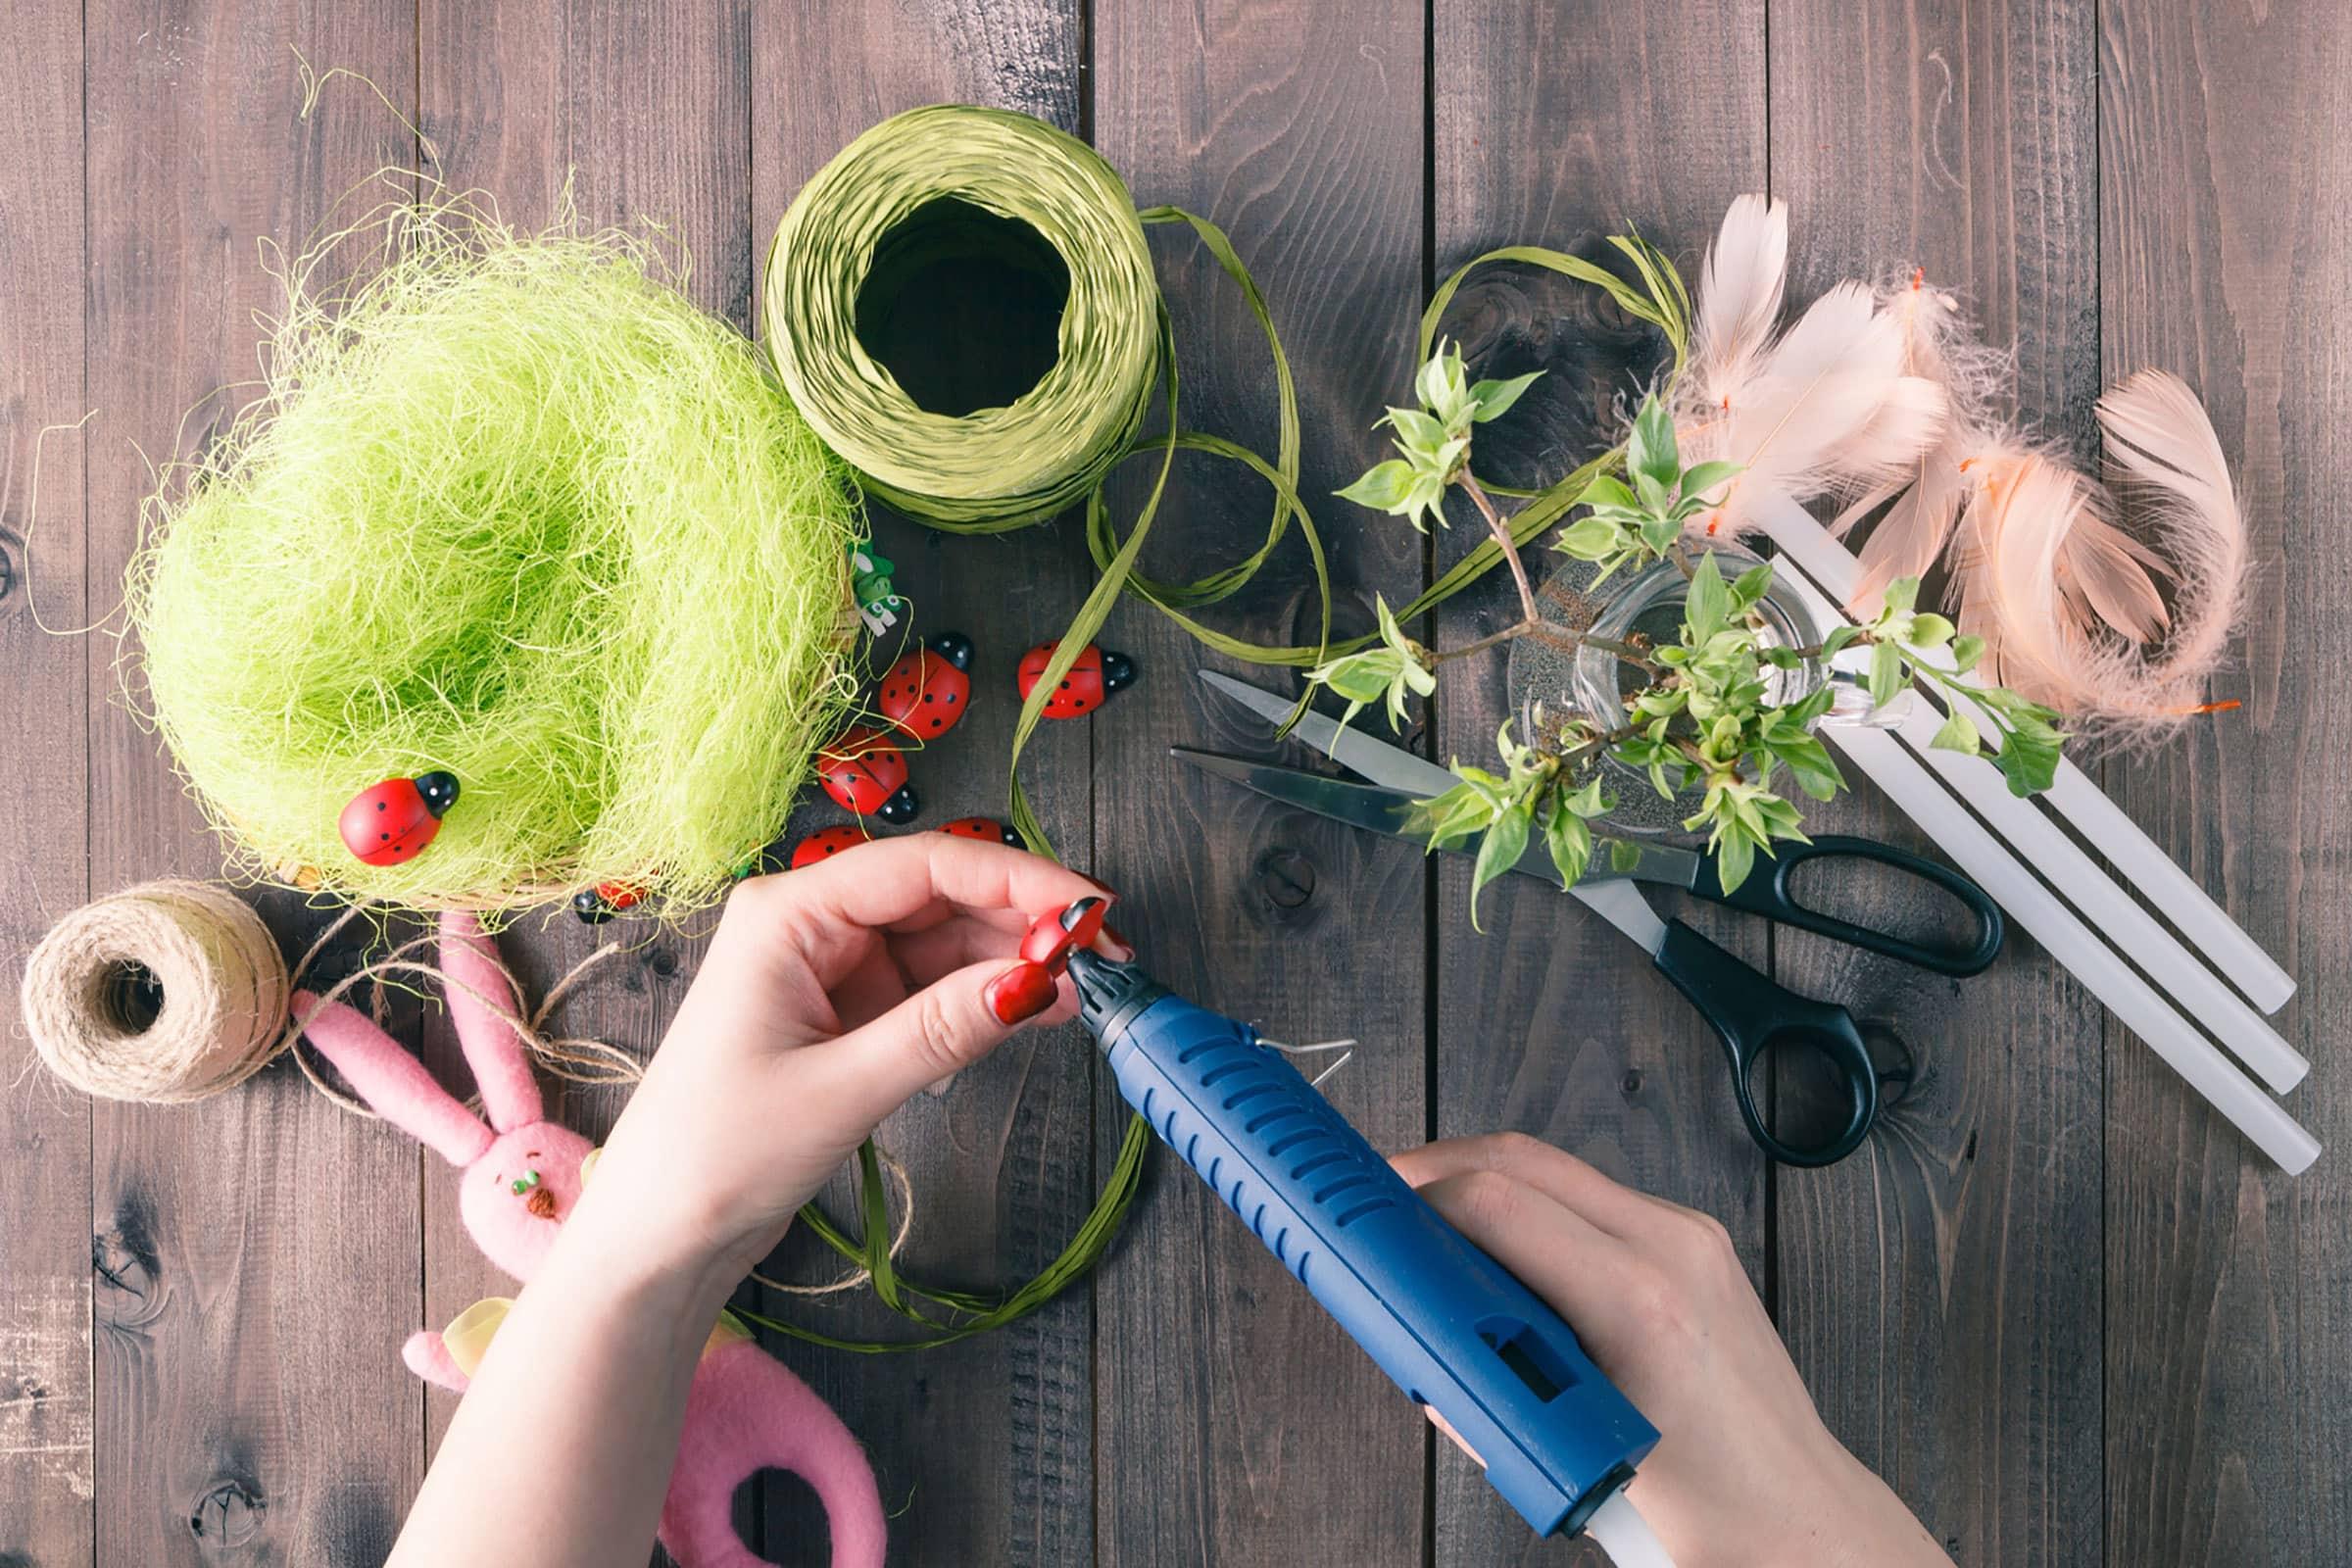 The Best Hot Glue Guns for Beautiful DIY Crafts - 27 Reviews